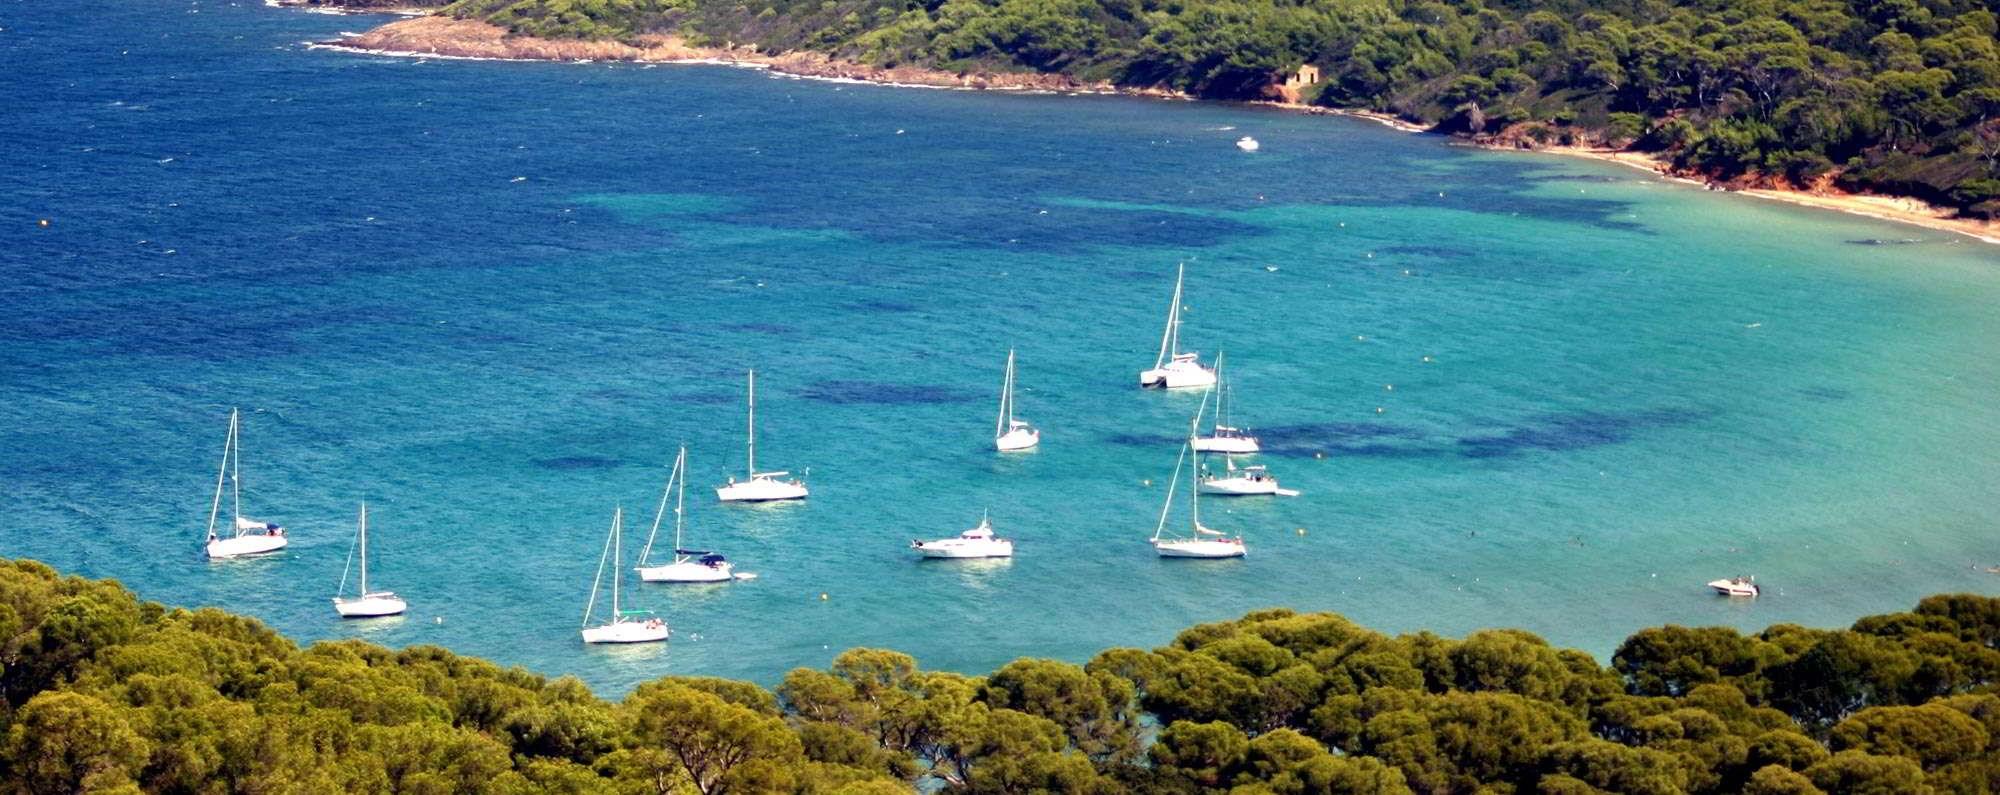 Yacht charter in Saint-Mandrier-sur-mer